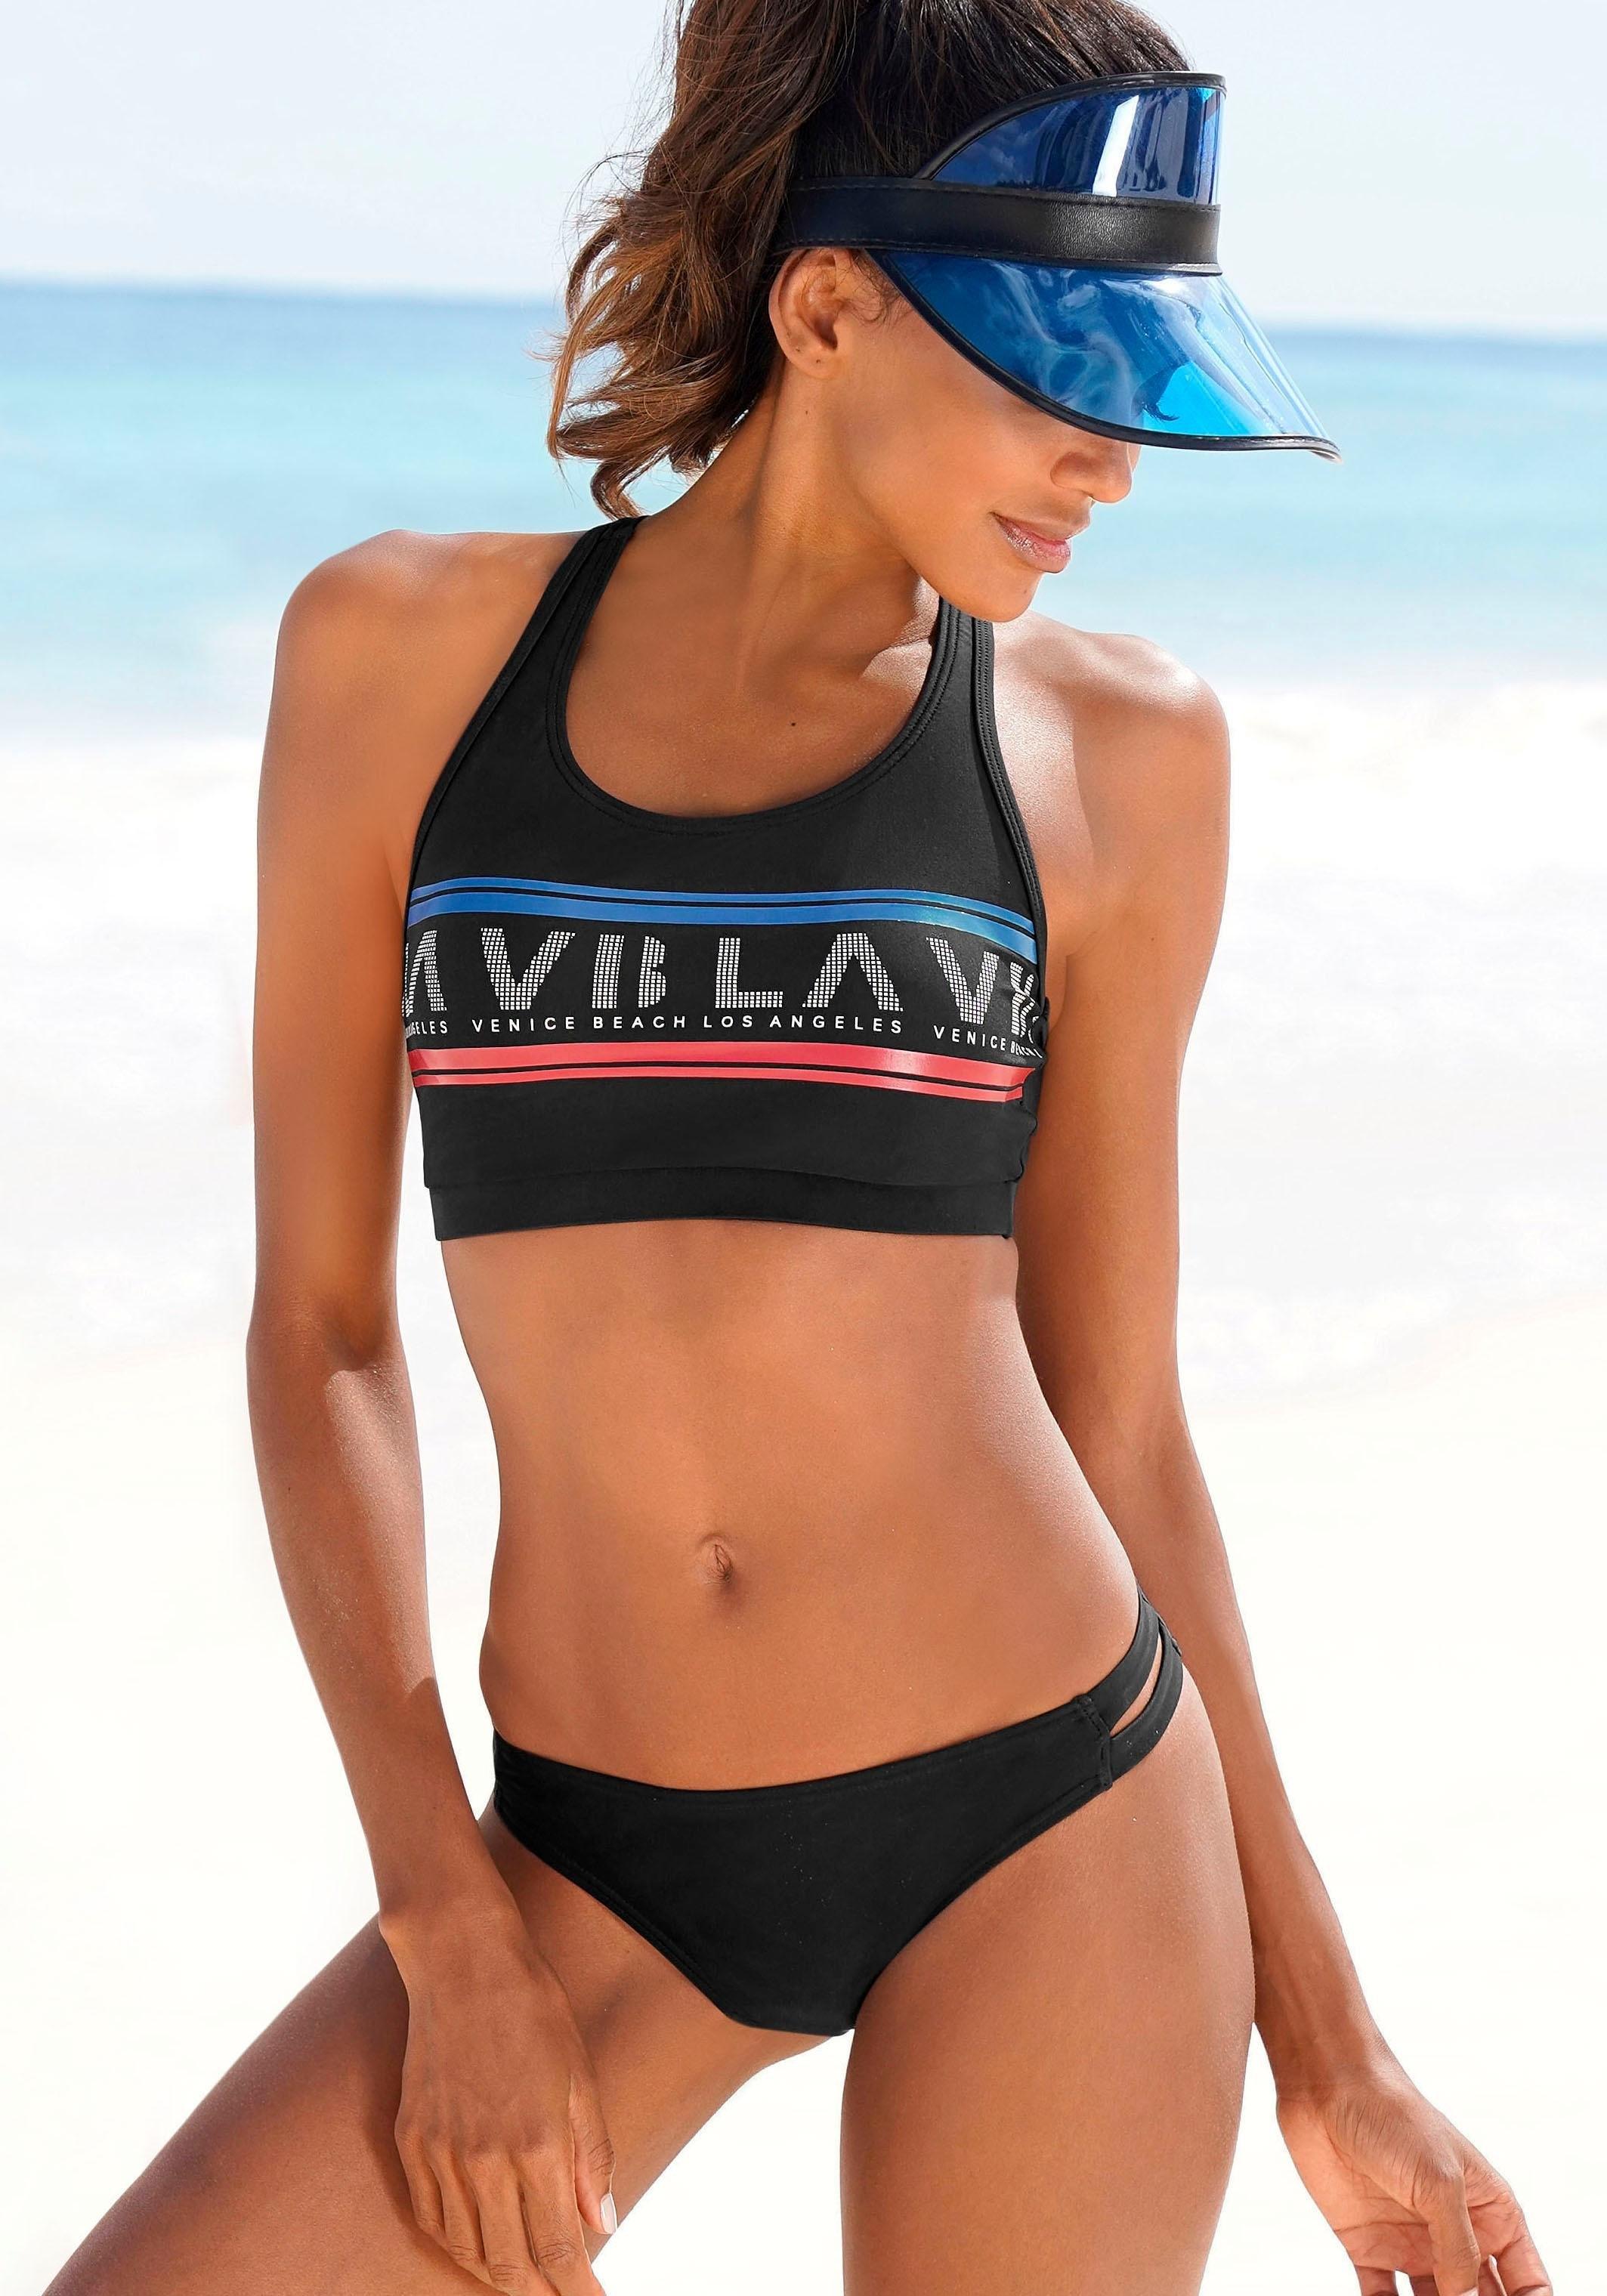 VENICE BEACH bustierbikini nu online kopen bij Lascana